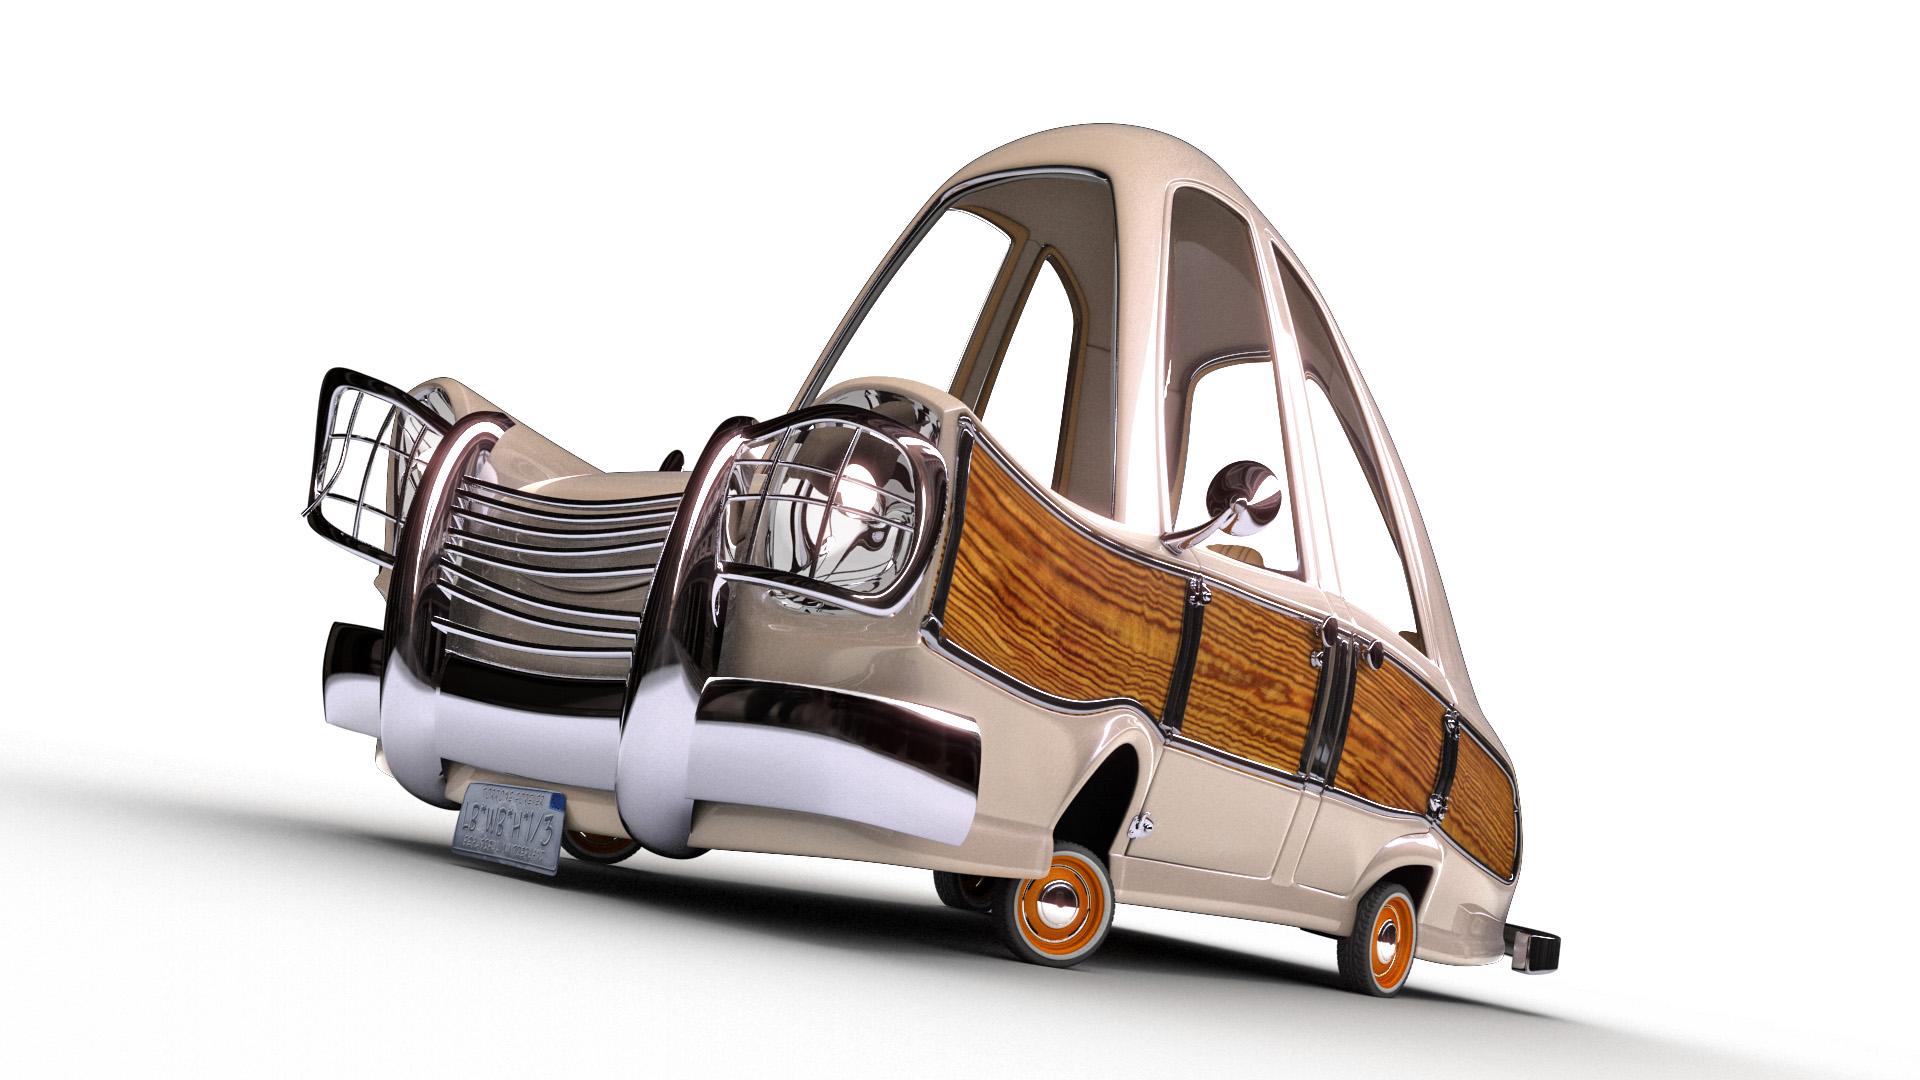 toblerone_car_image02